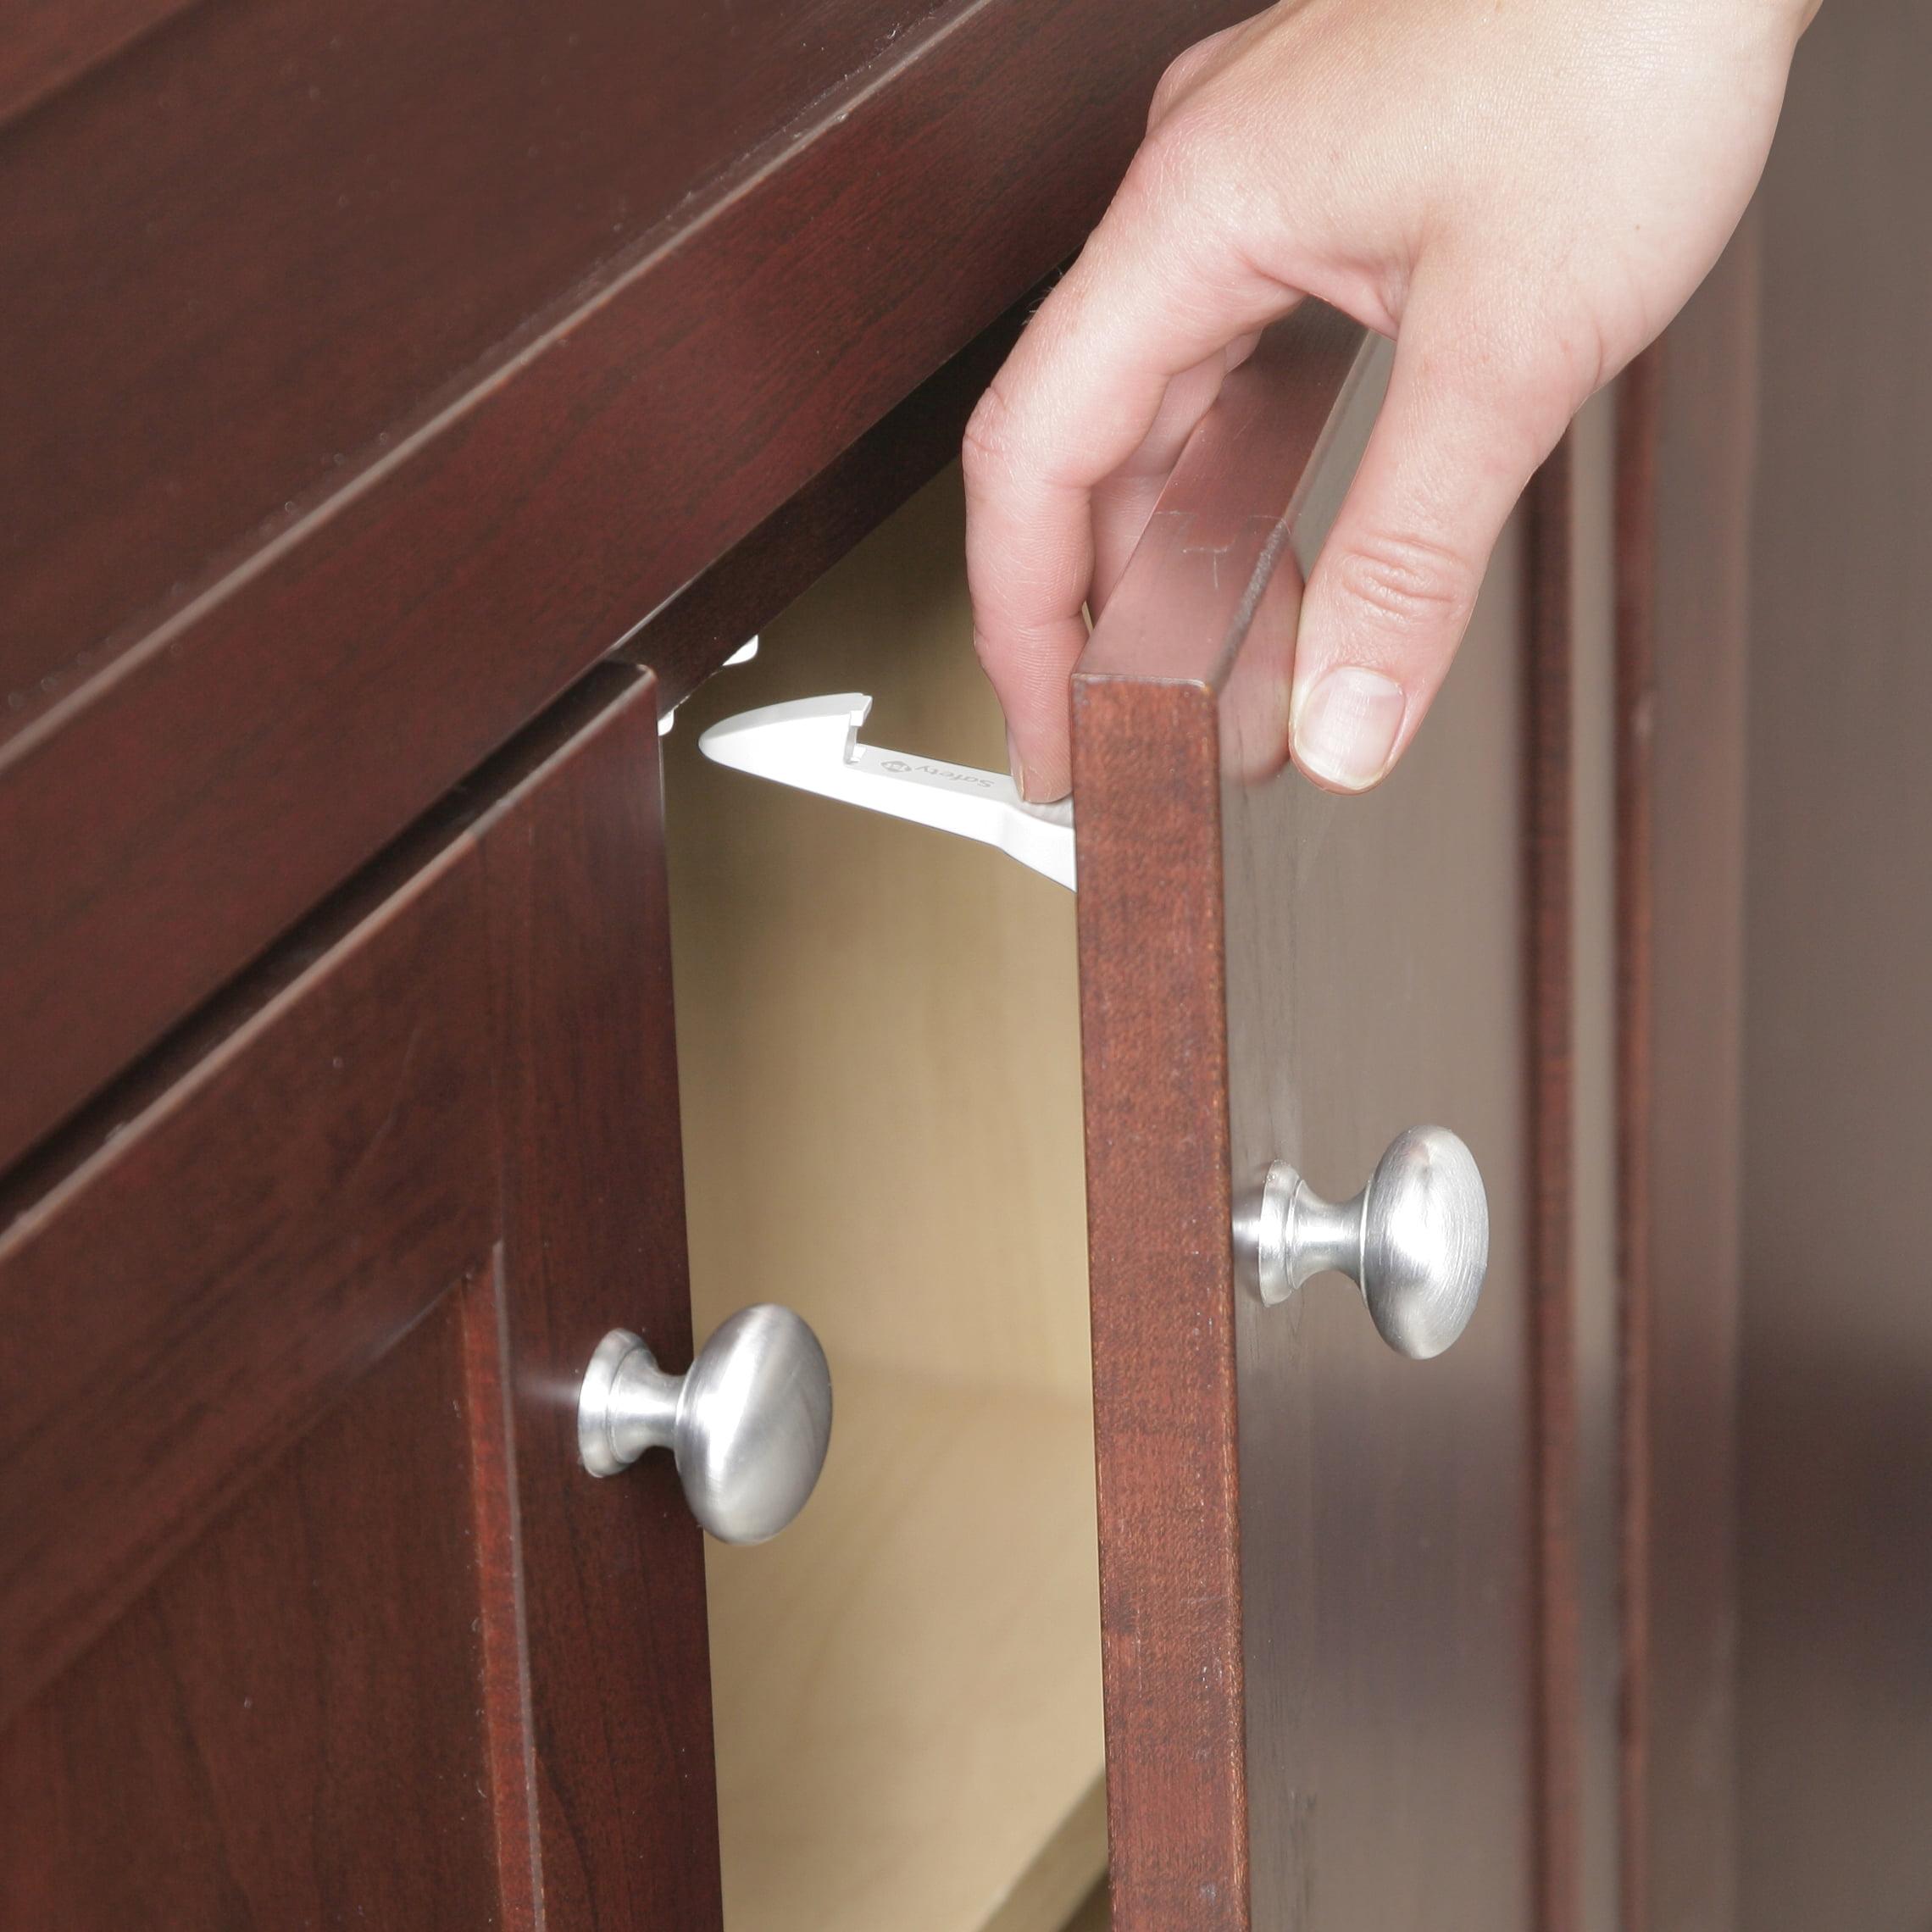 Safety 1ˢᵗ Spring-Loaded Cabinet & Drawer Latch (10pk), White